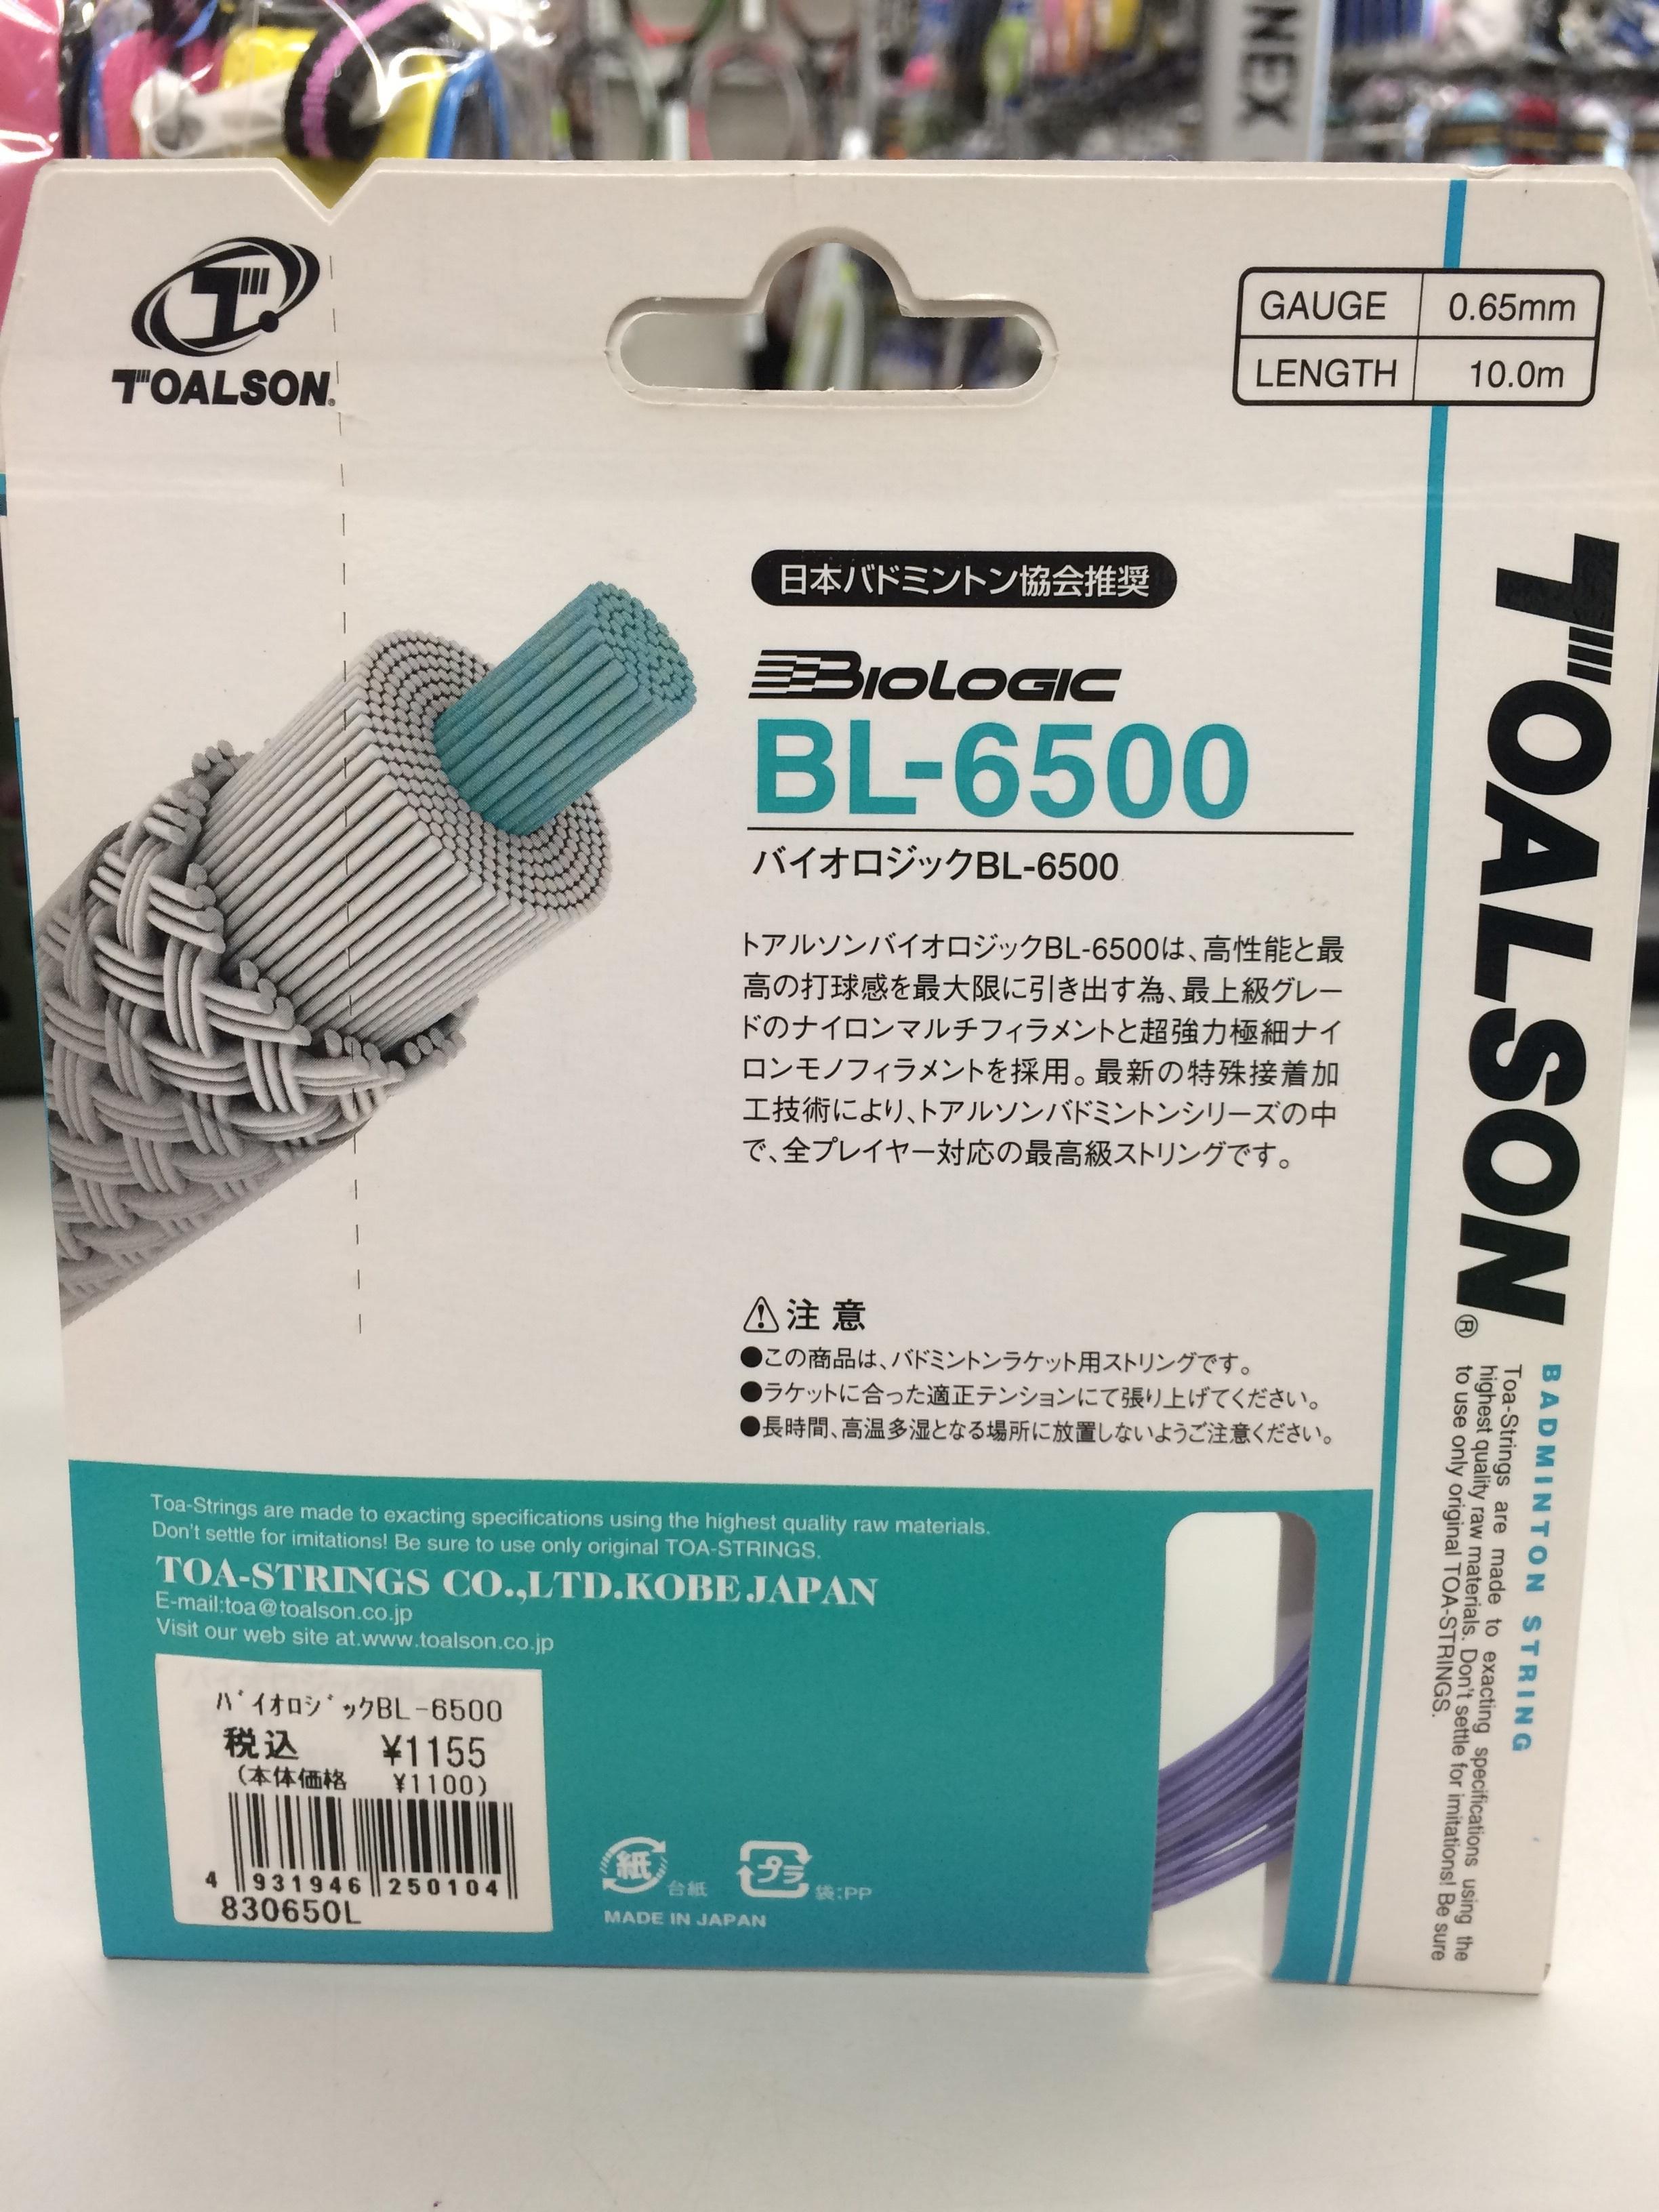 TOALSON  響 BL-6500  - 画像2